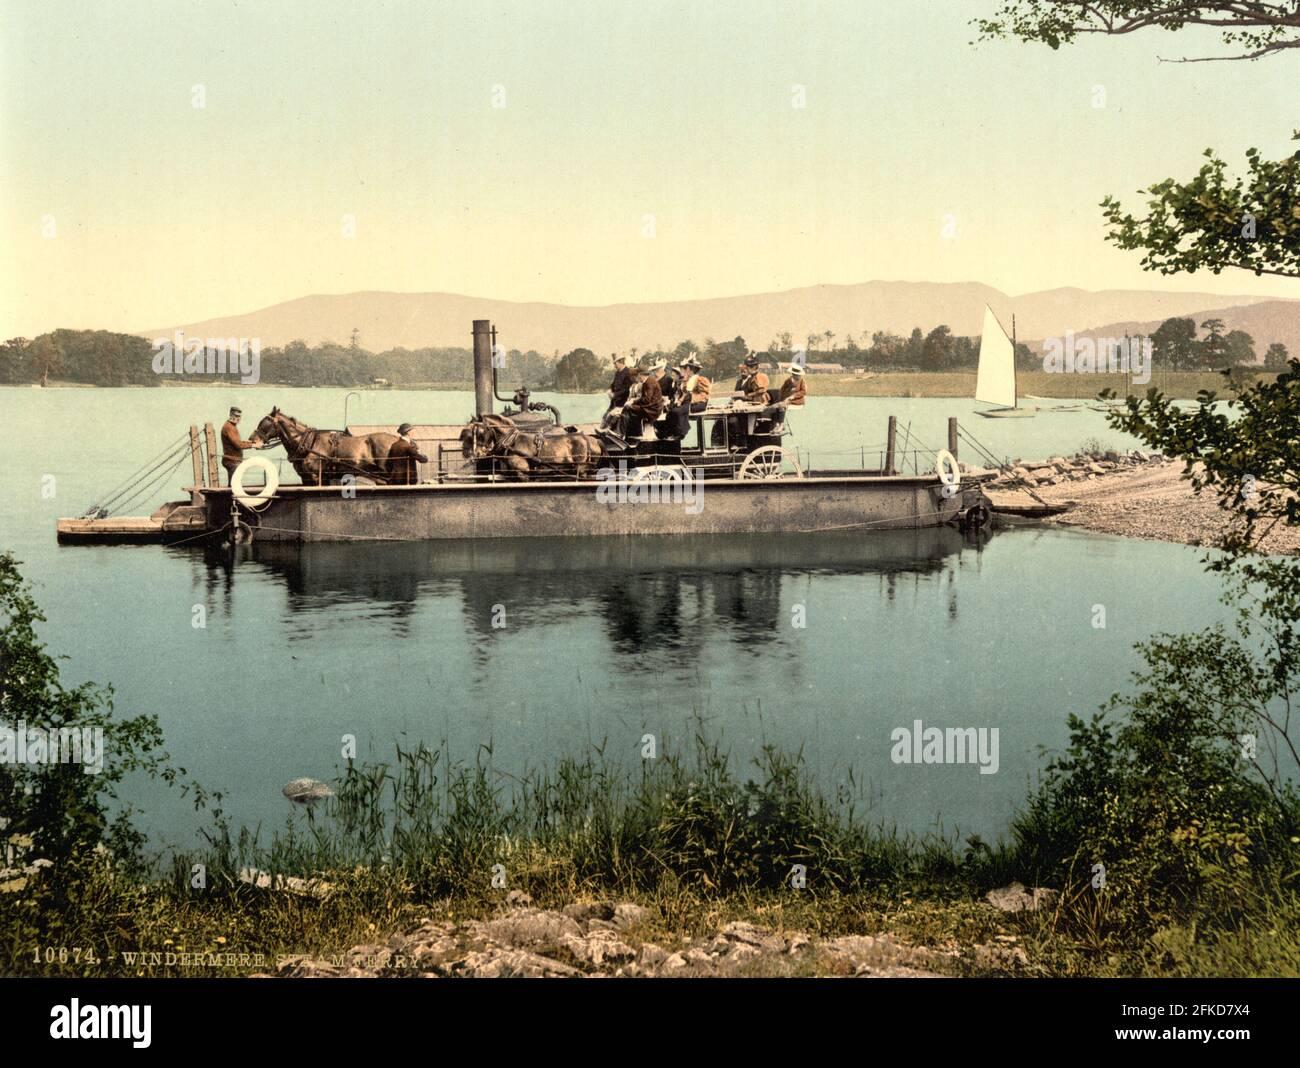 The Windermere Steam Ferry in The Lake District, Cumbria circa 1890-1900 Stock Photo